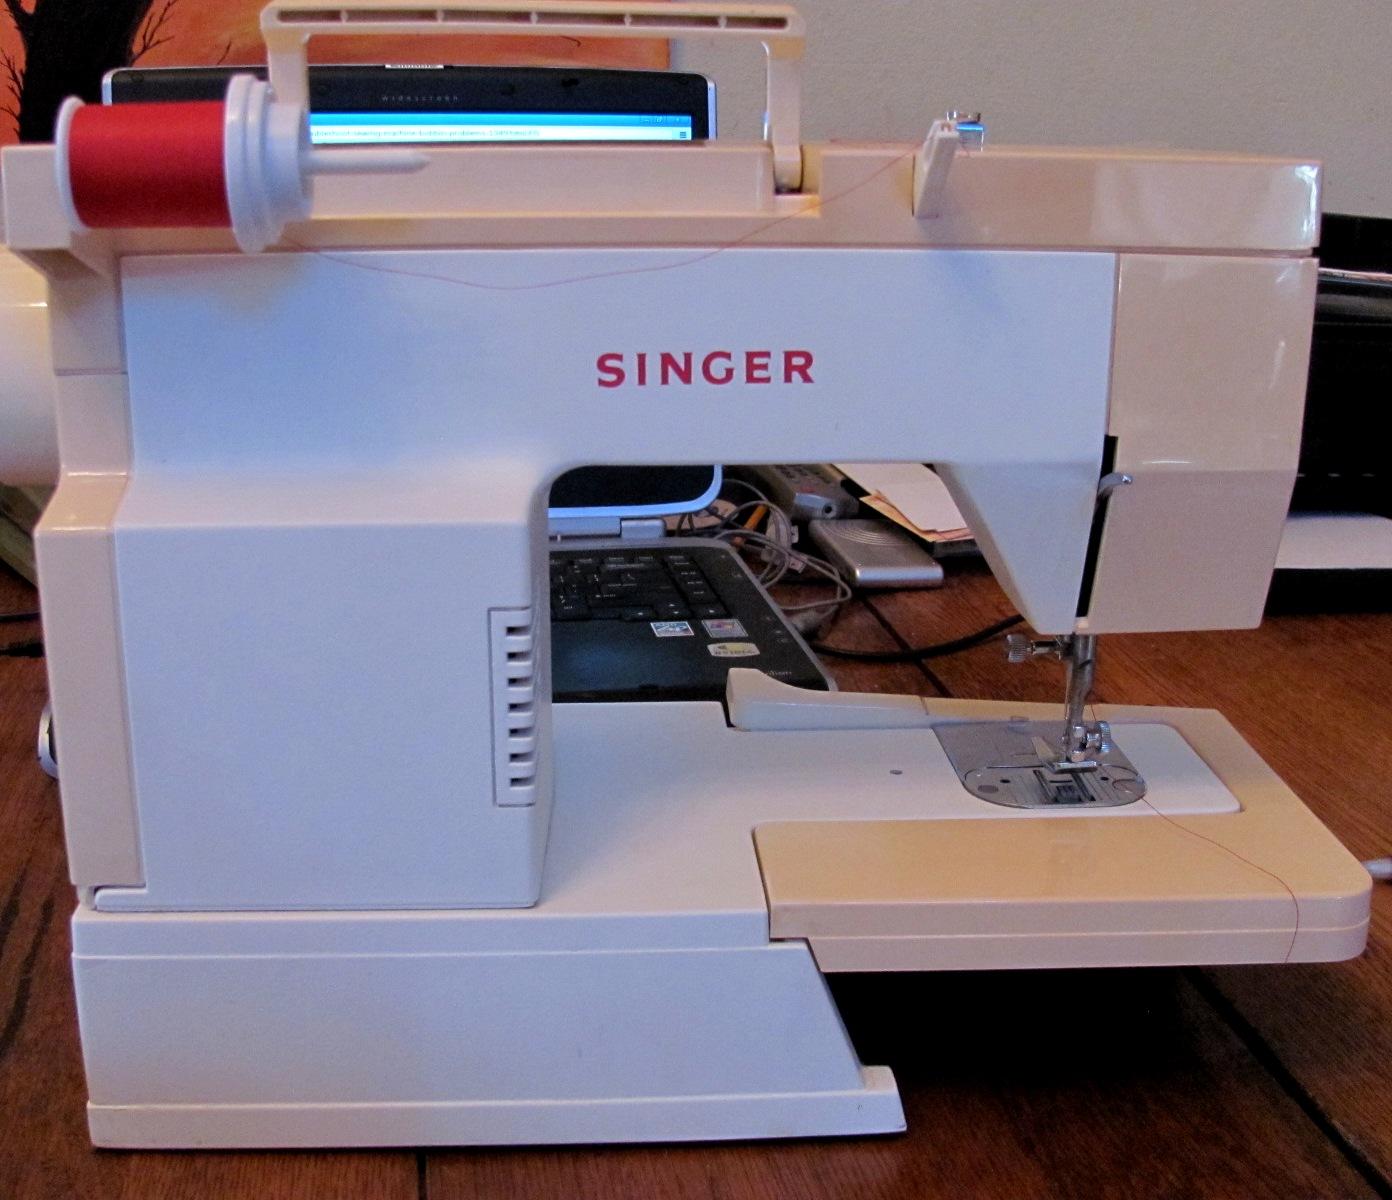 the sewing machine rescue singer 5808c rh sewingmachinerescue blogspot com singer 5808c owners manual singer 5808c manual download